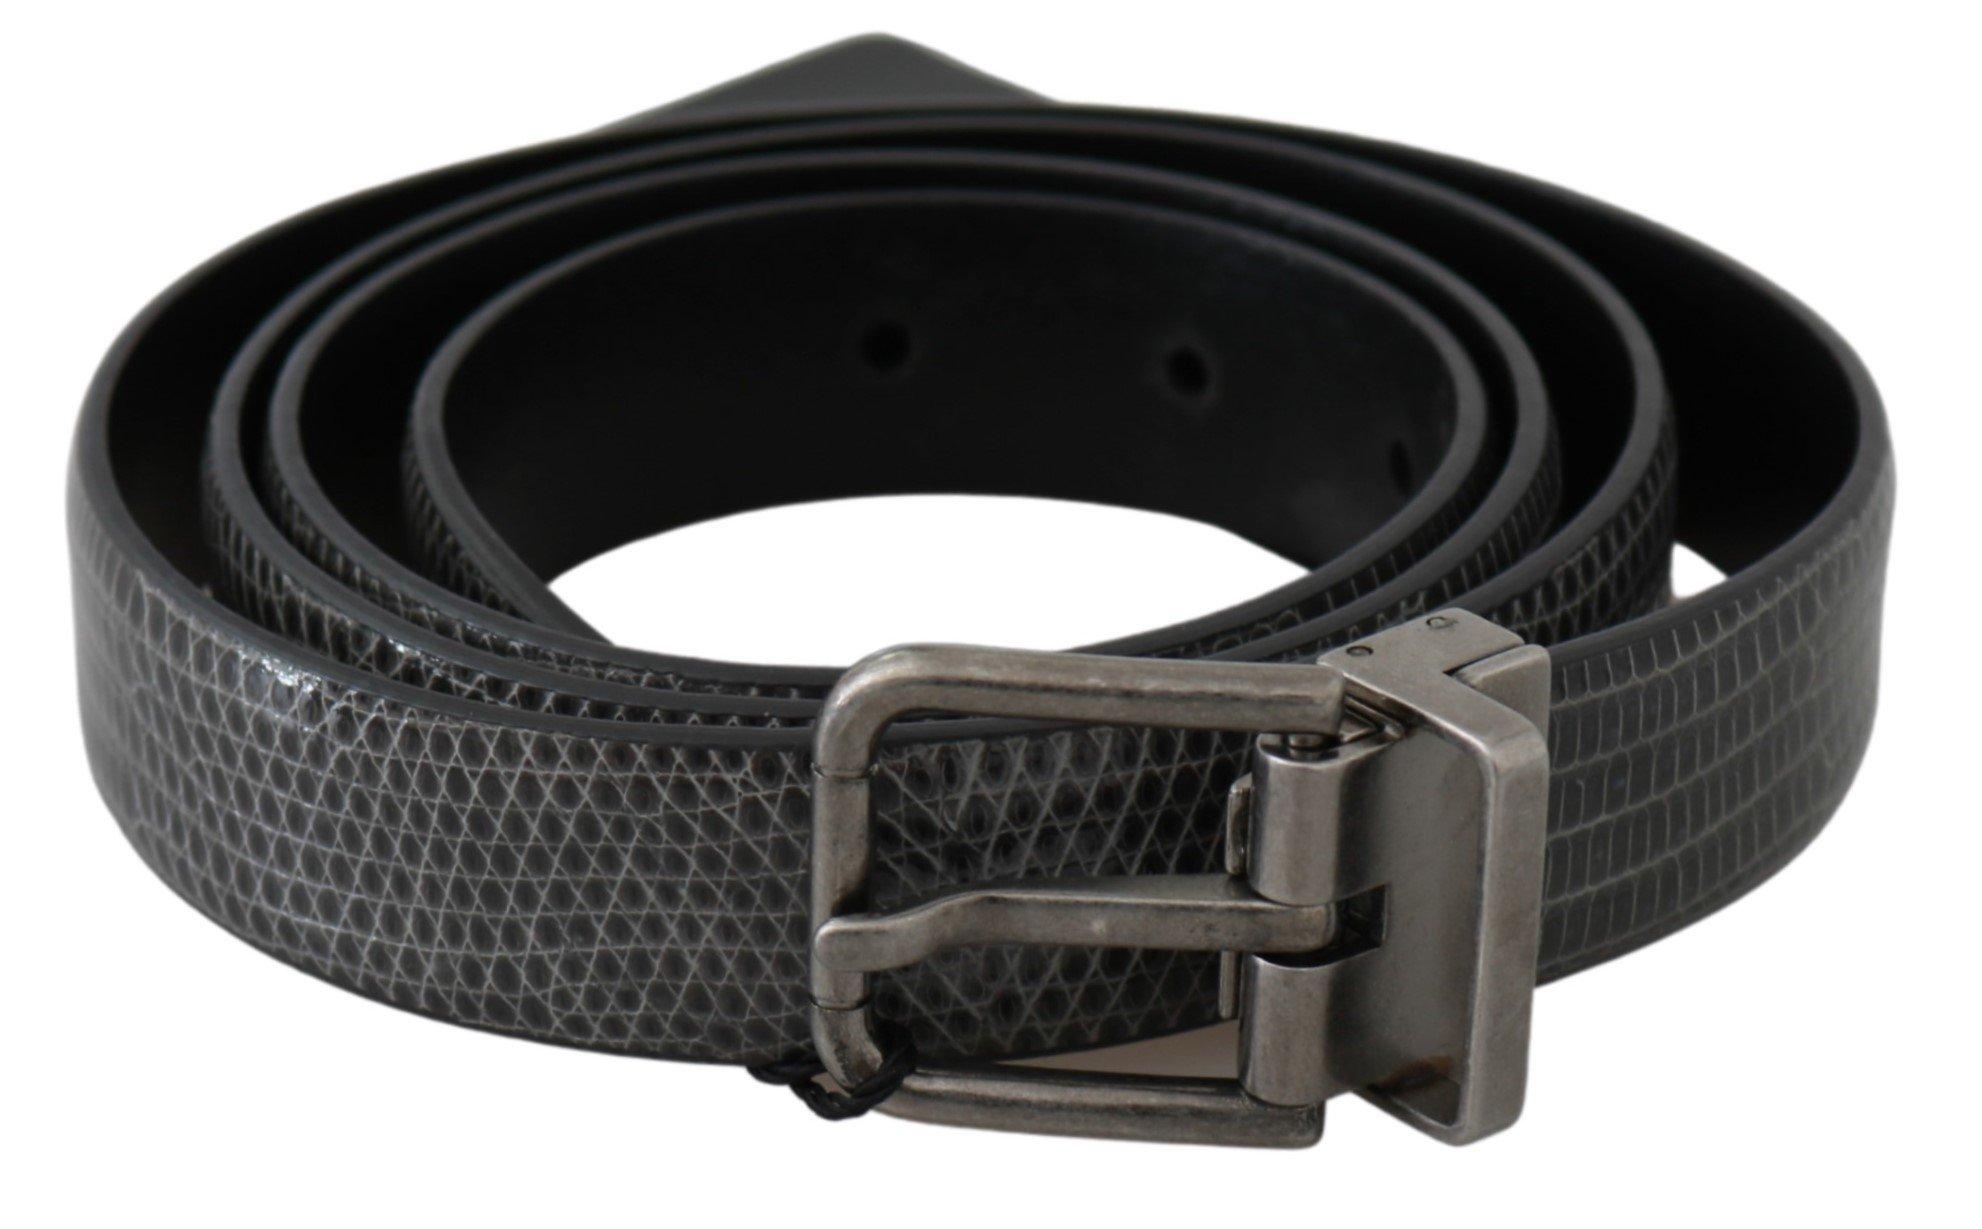 Dolce & Gabbana Men's Leather Exotic Skin Buckle Belt Grey BEL60631 - 100 cm / 40 Inches